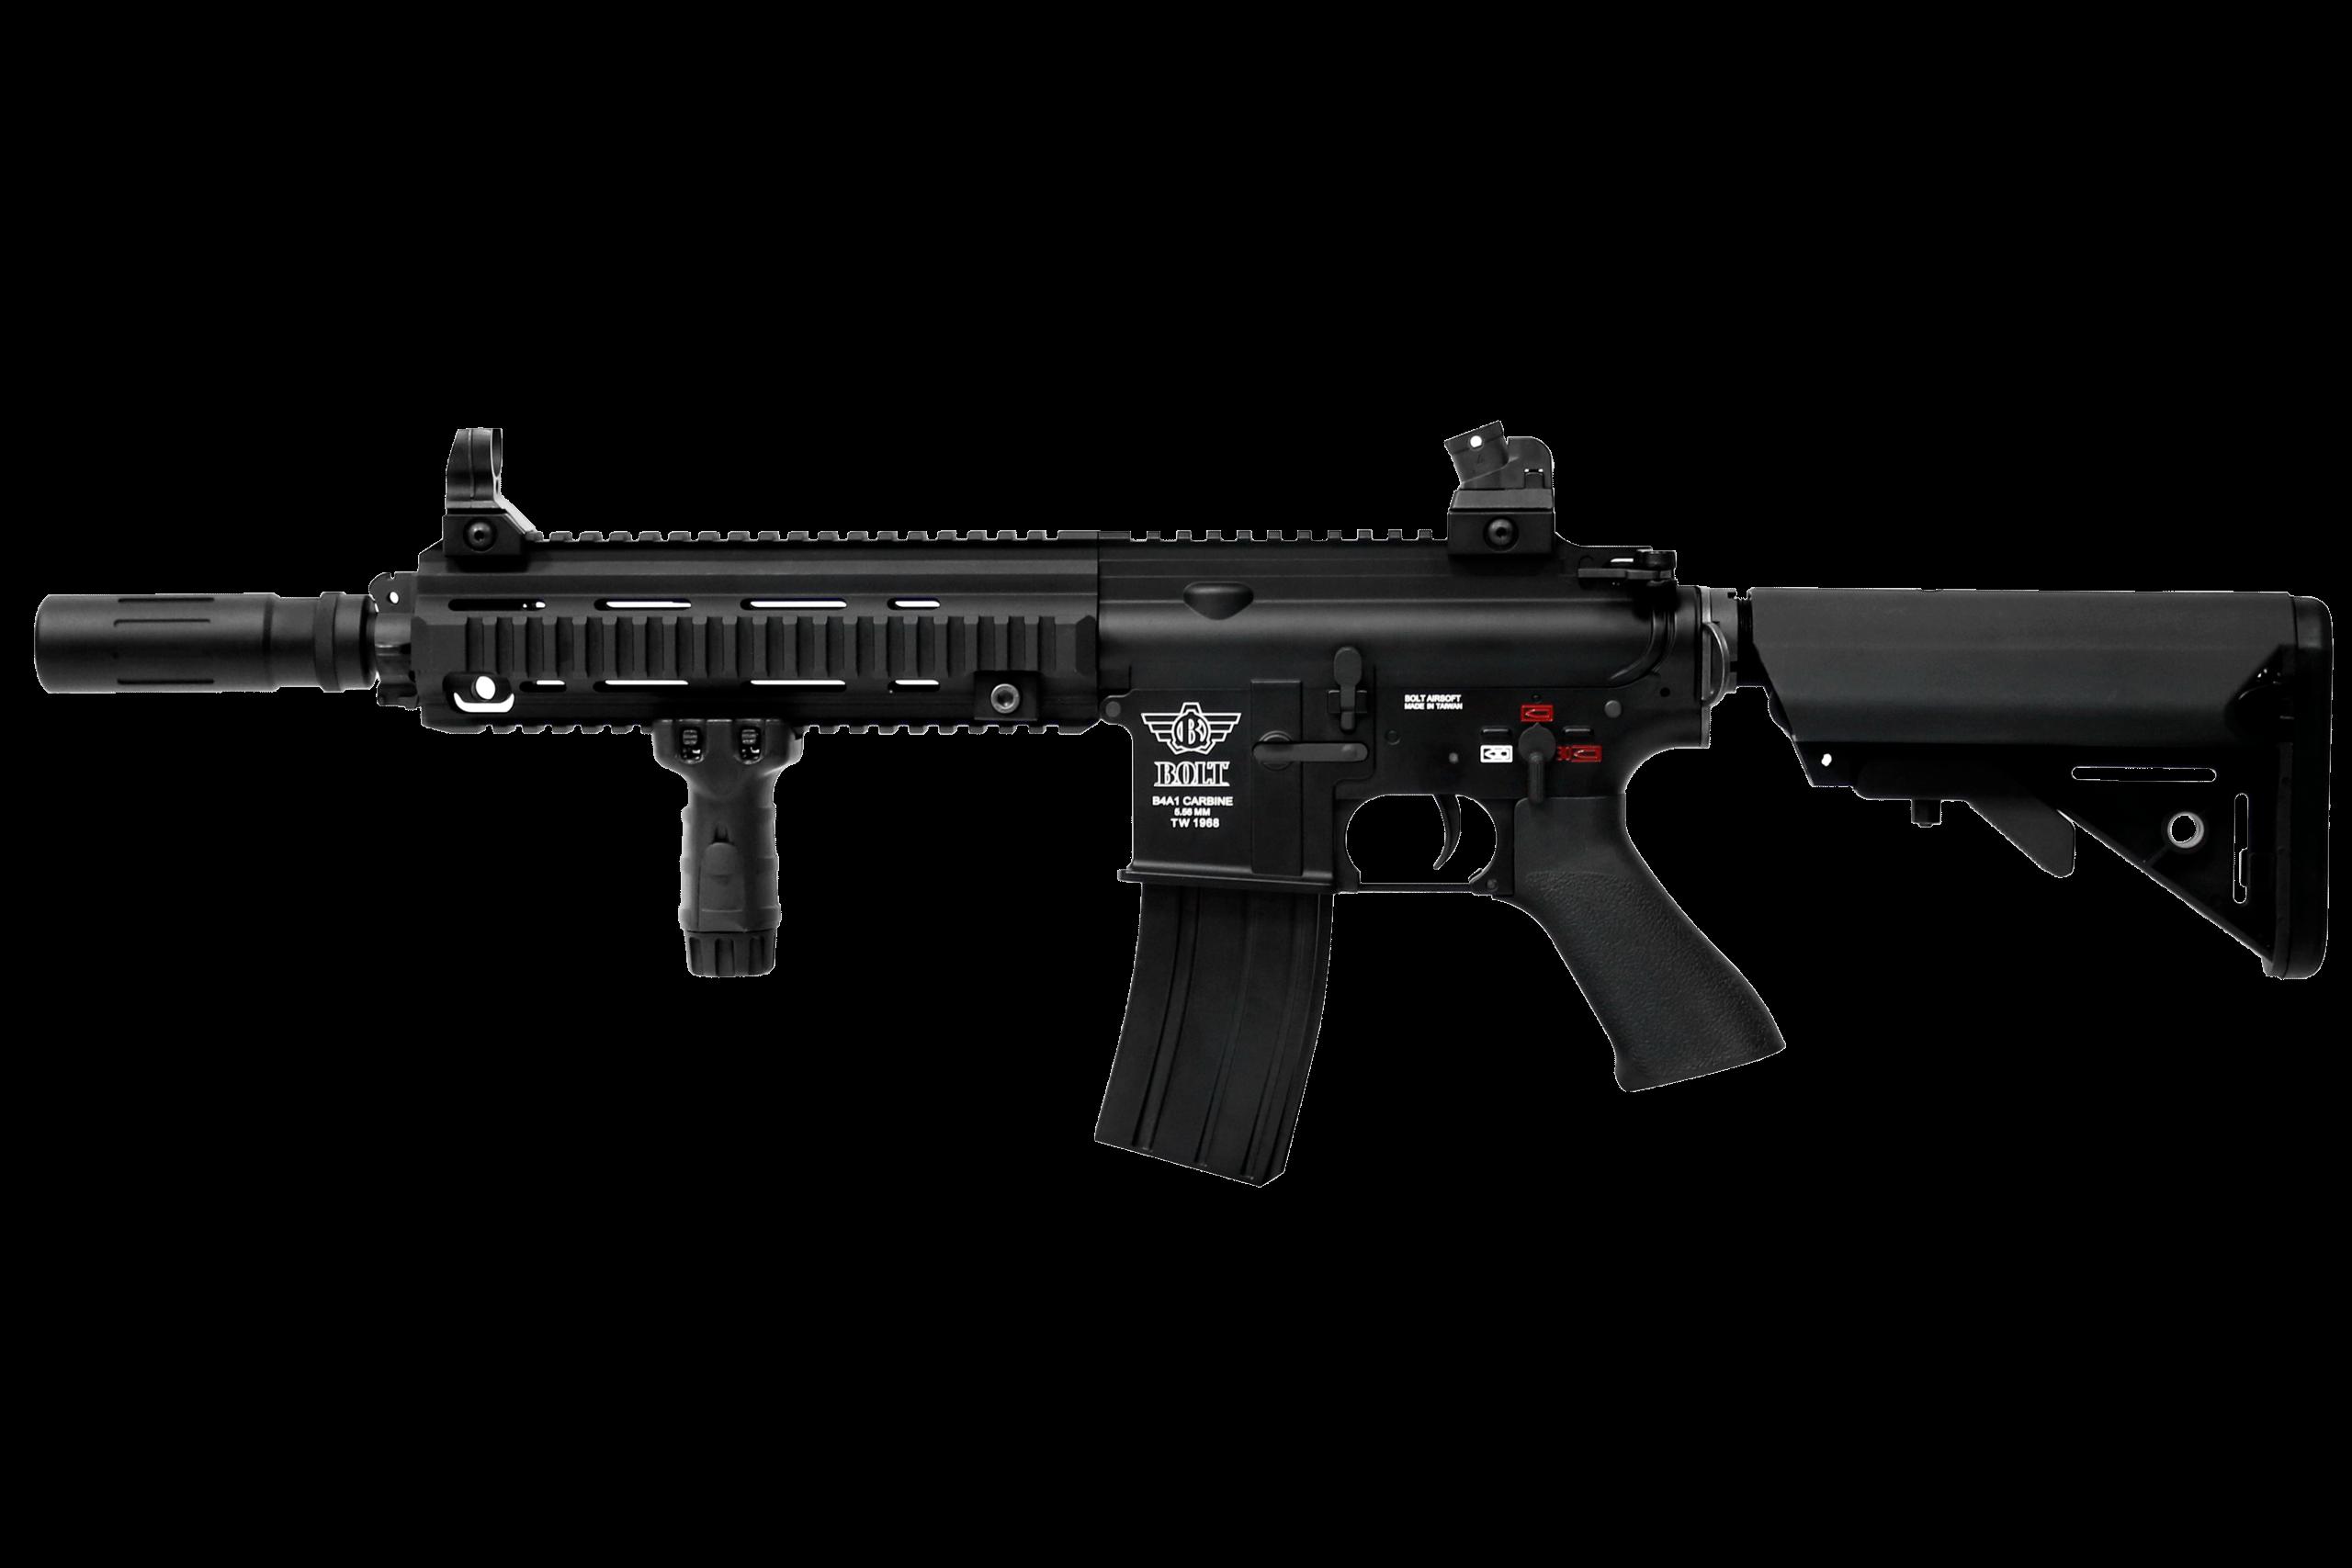 Bolt B4 DEVGRU Suppressed (Short) - Airsoft Rifle